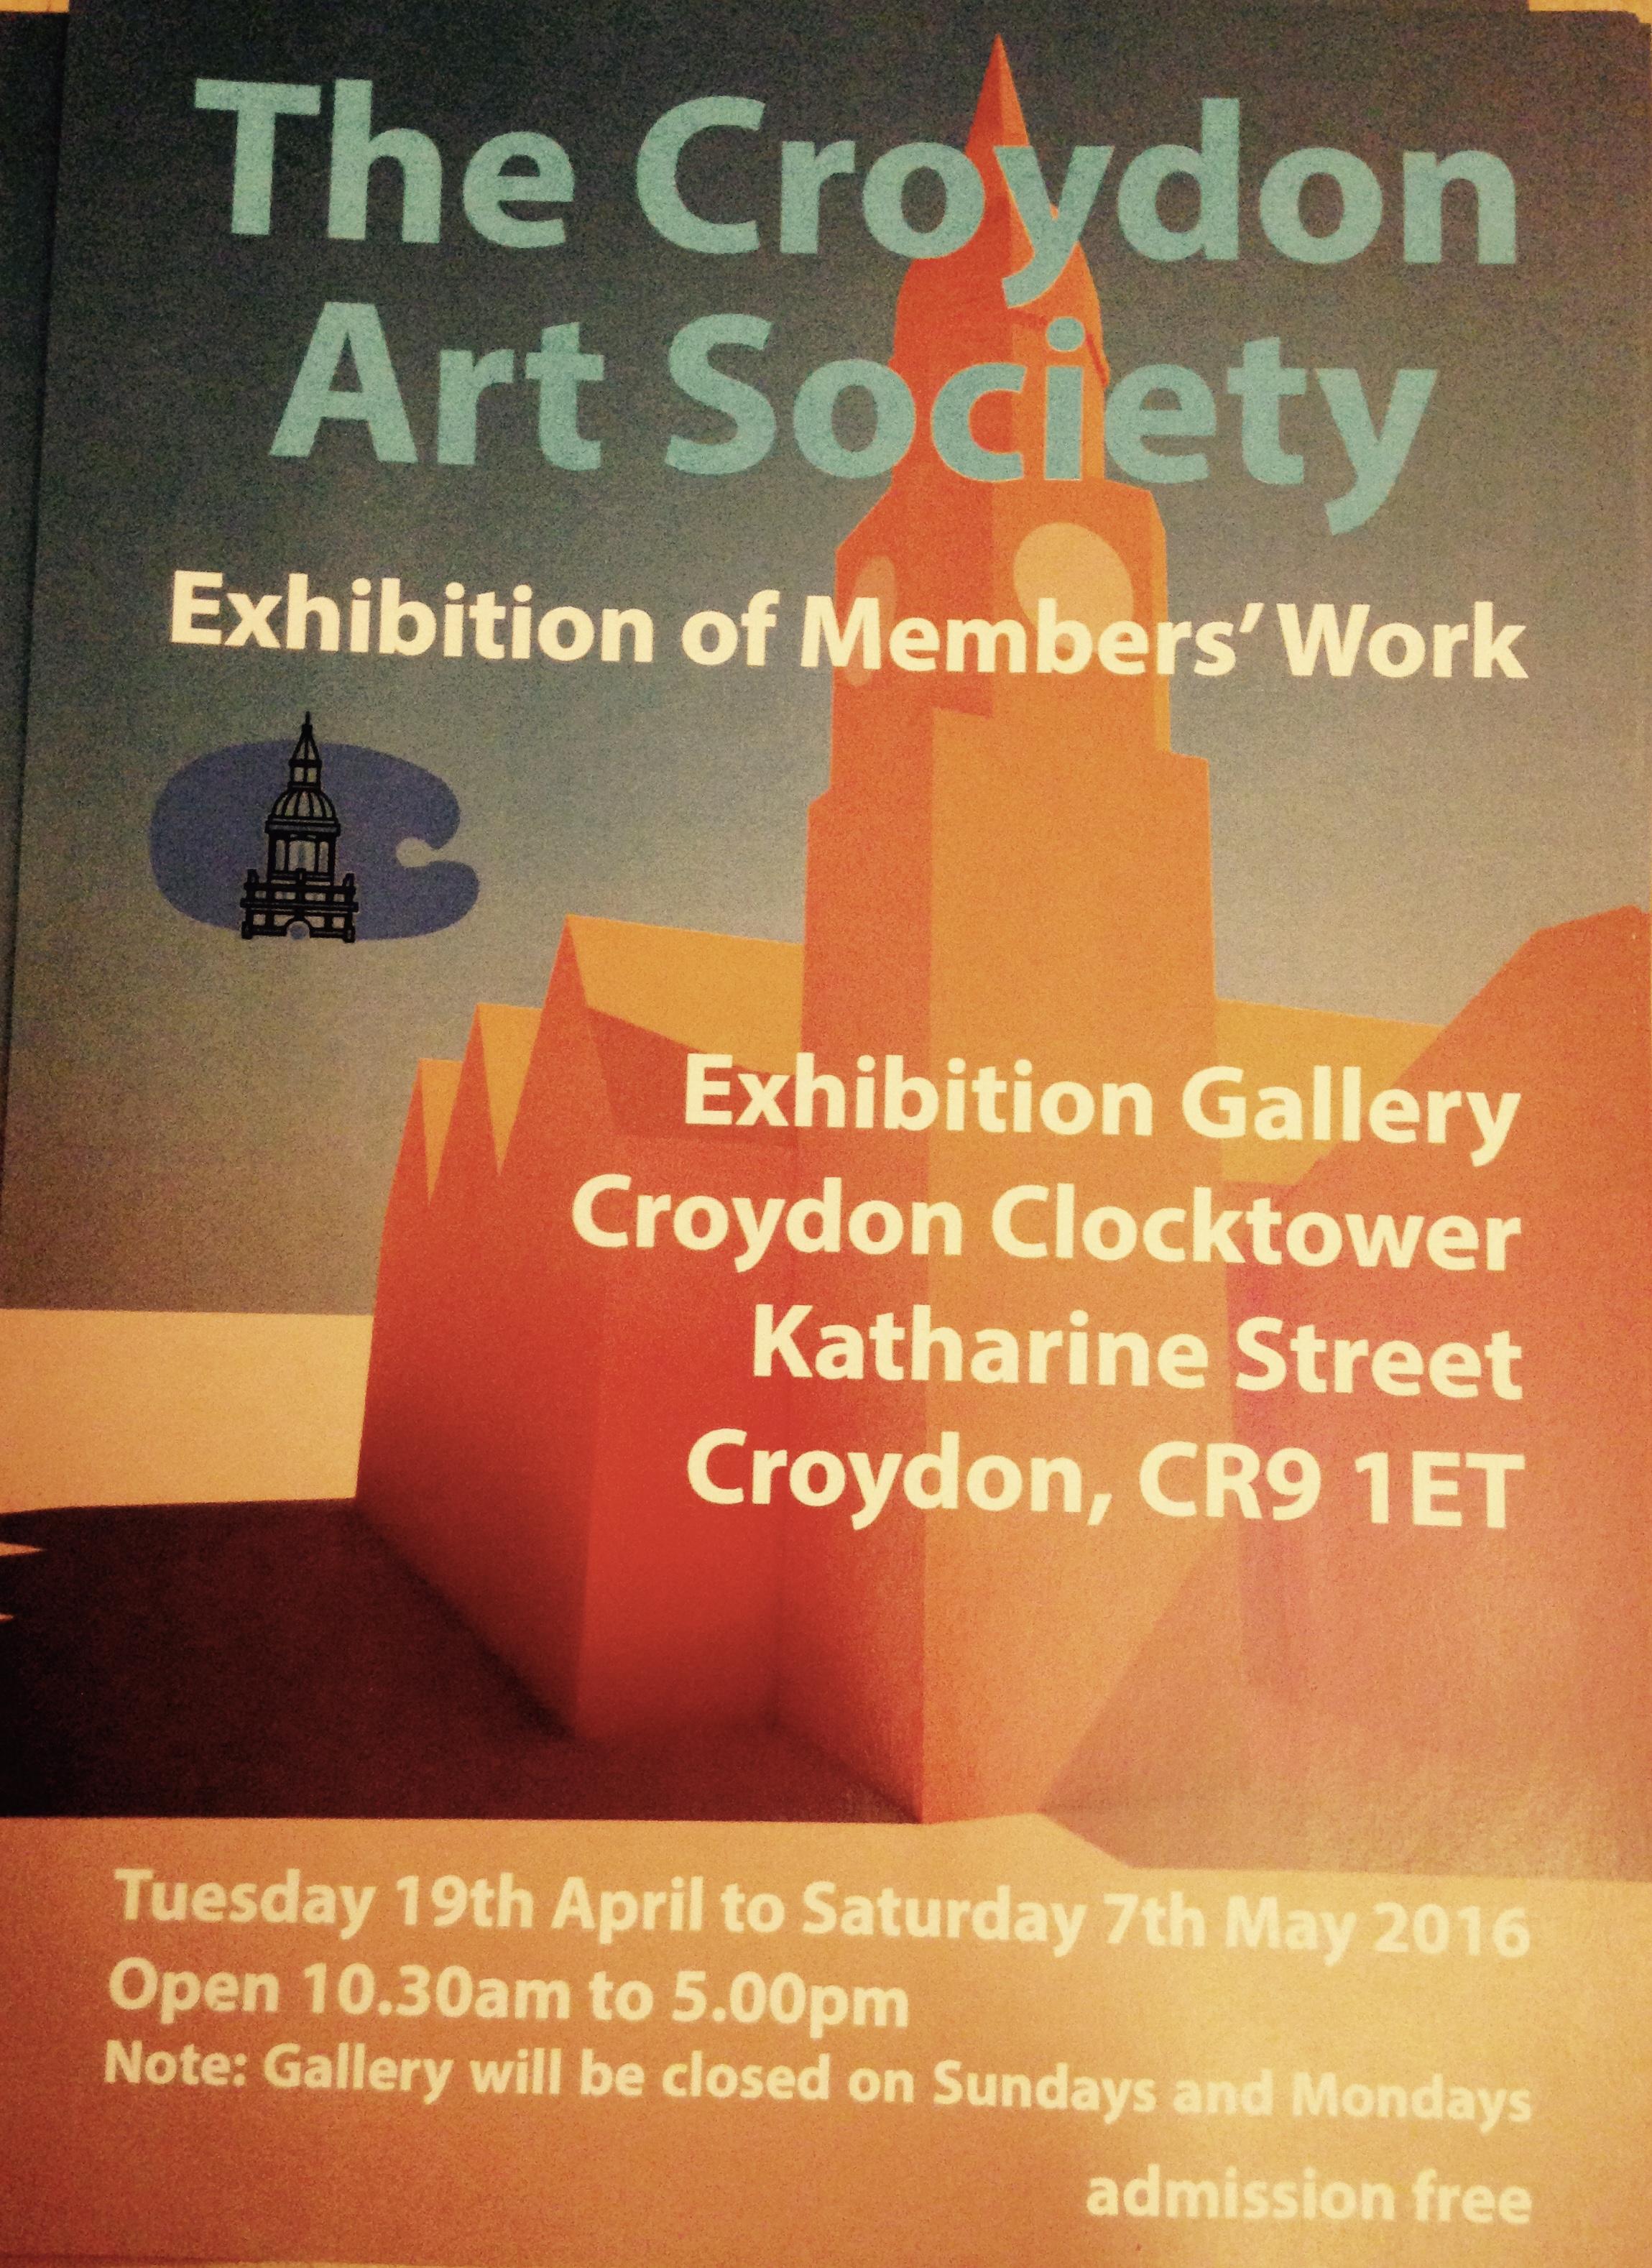 The Croydon Art Society